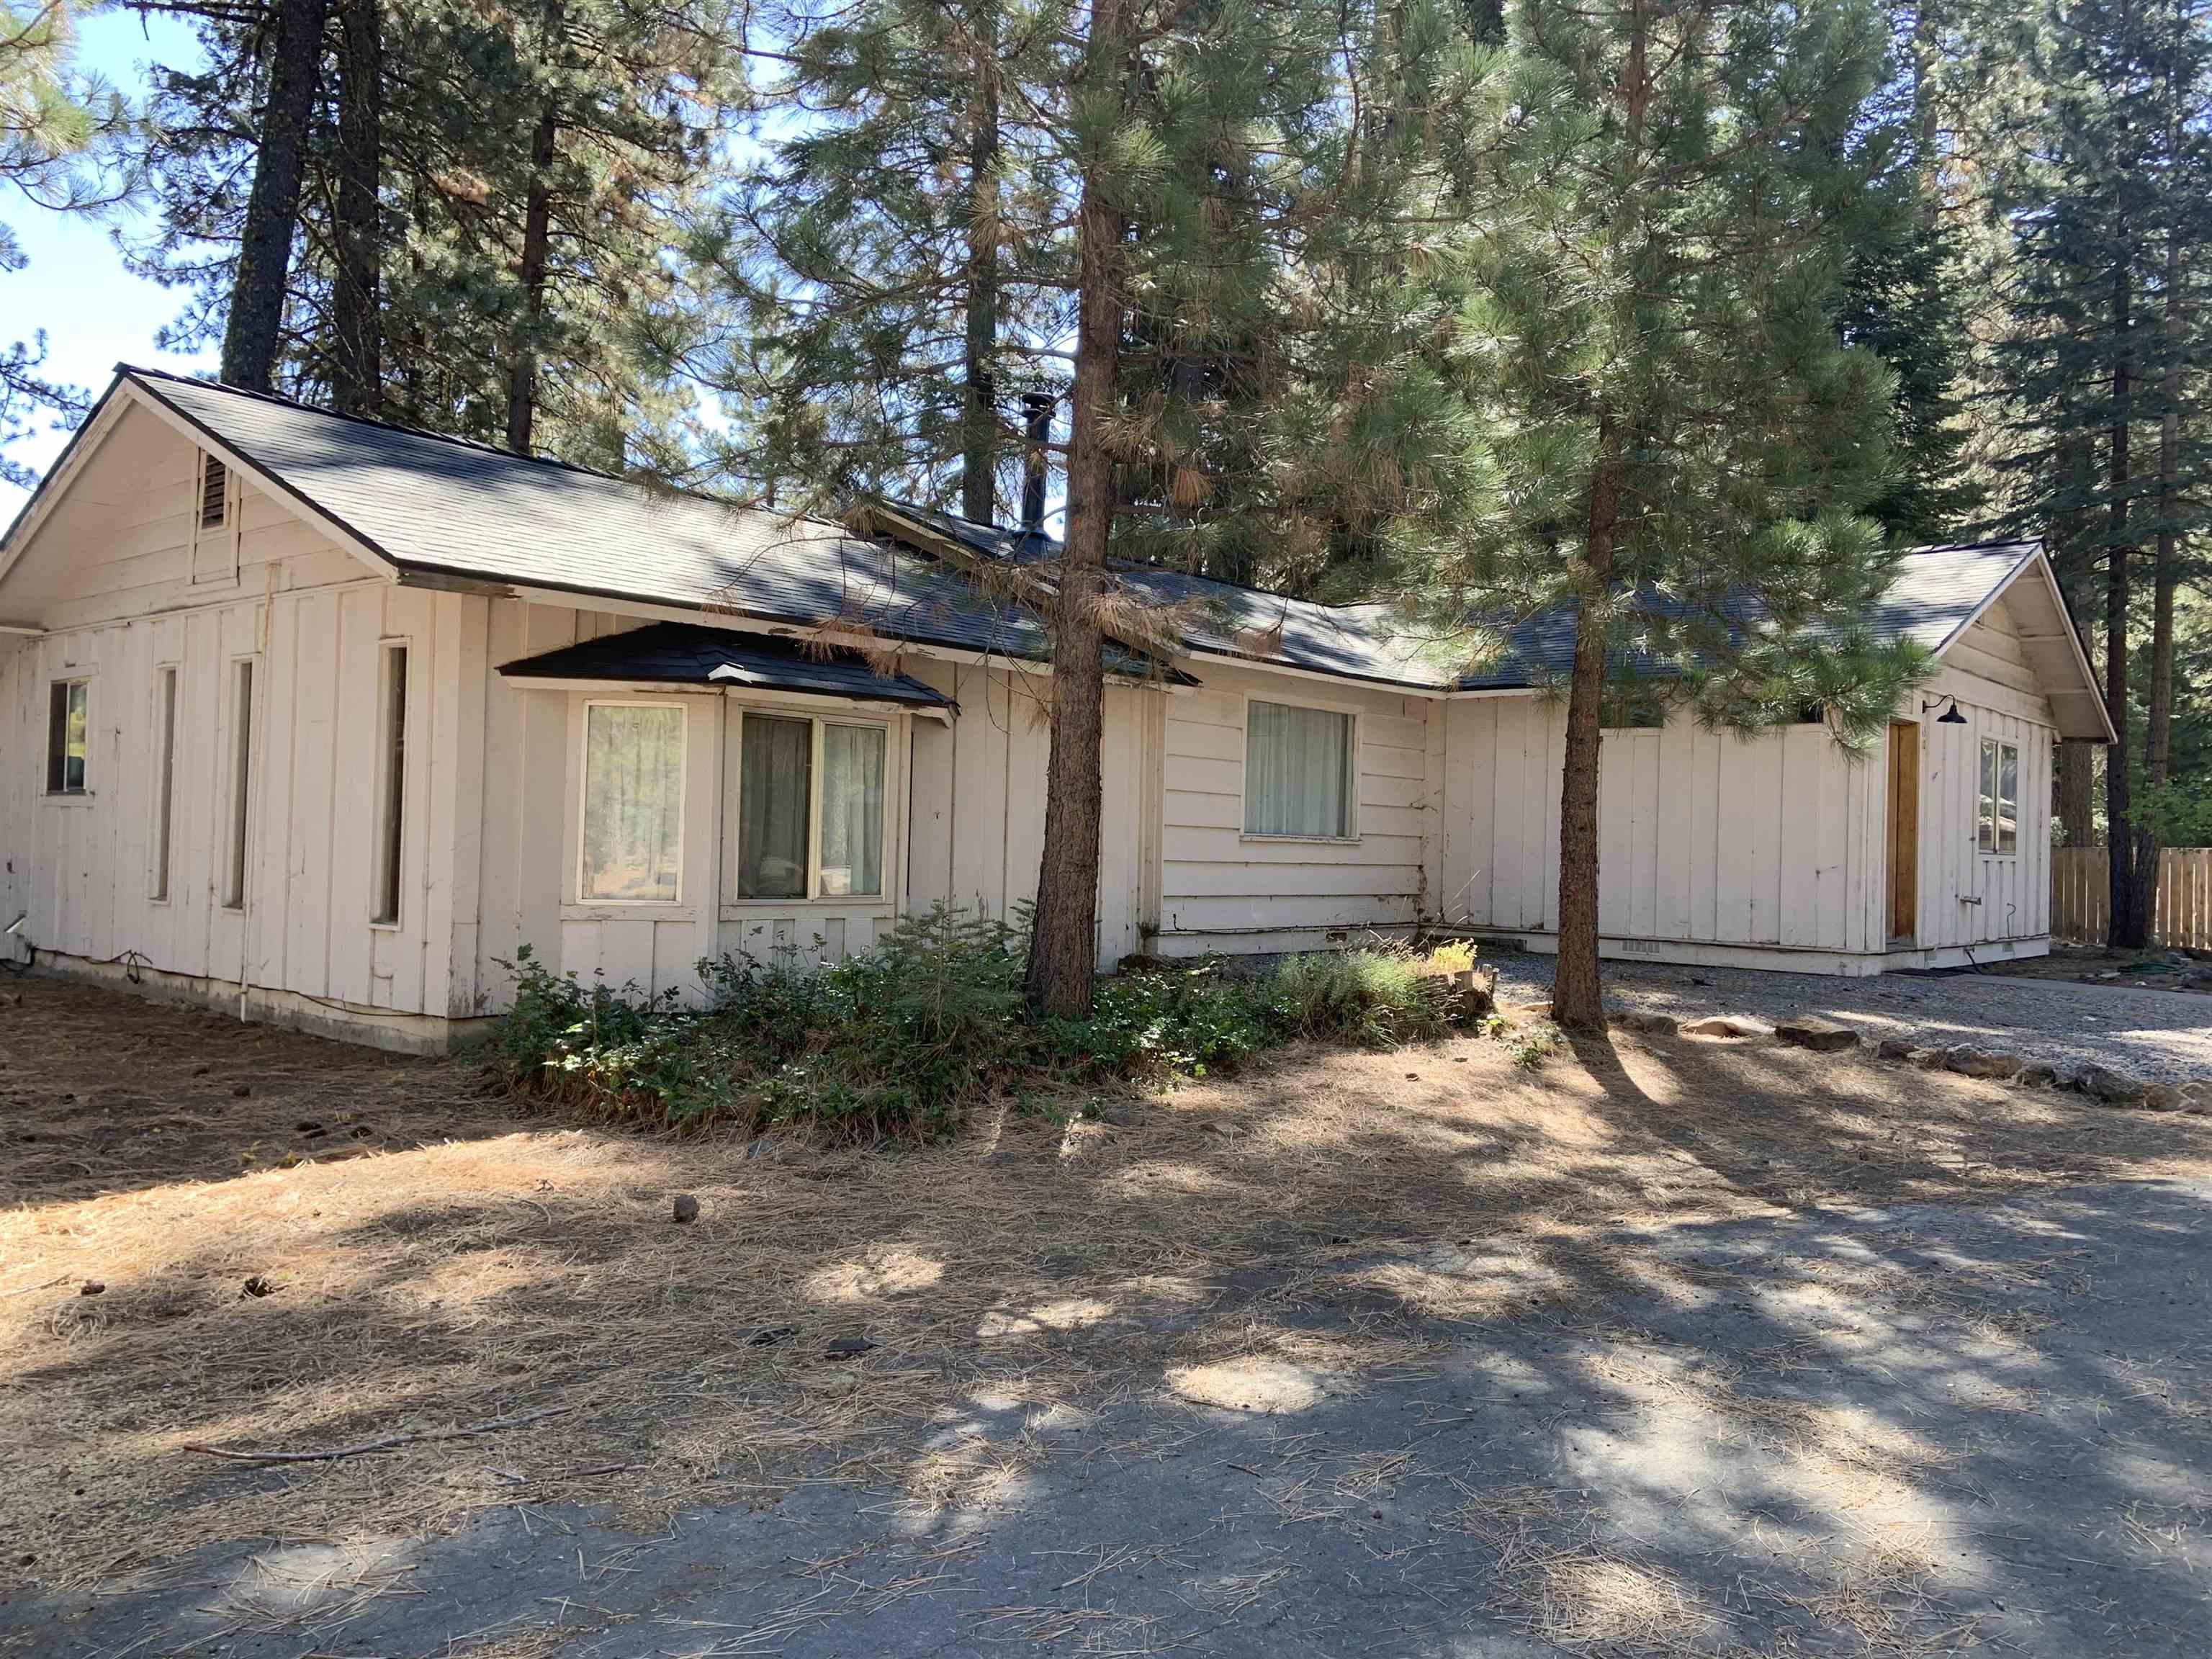 463-310 Wilson Way, Clear Creek, CA 96137